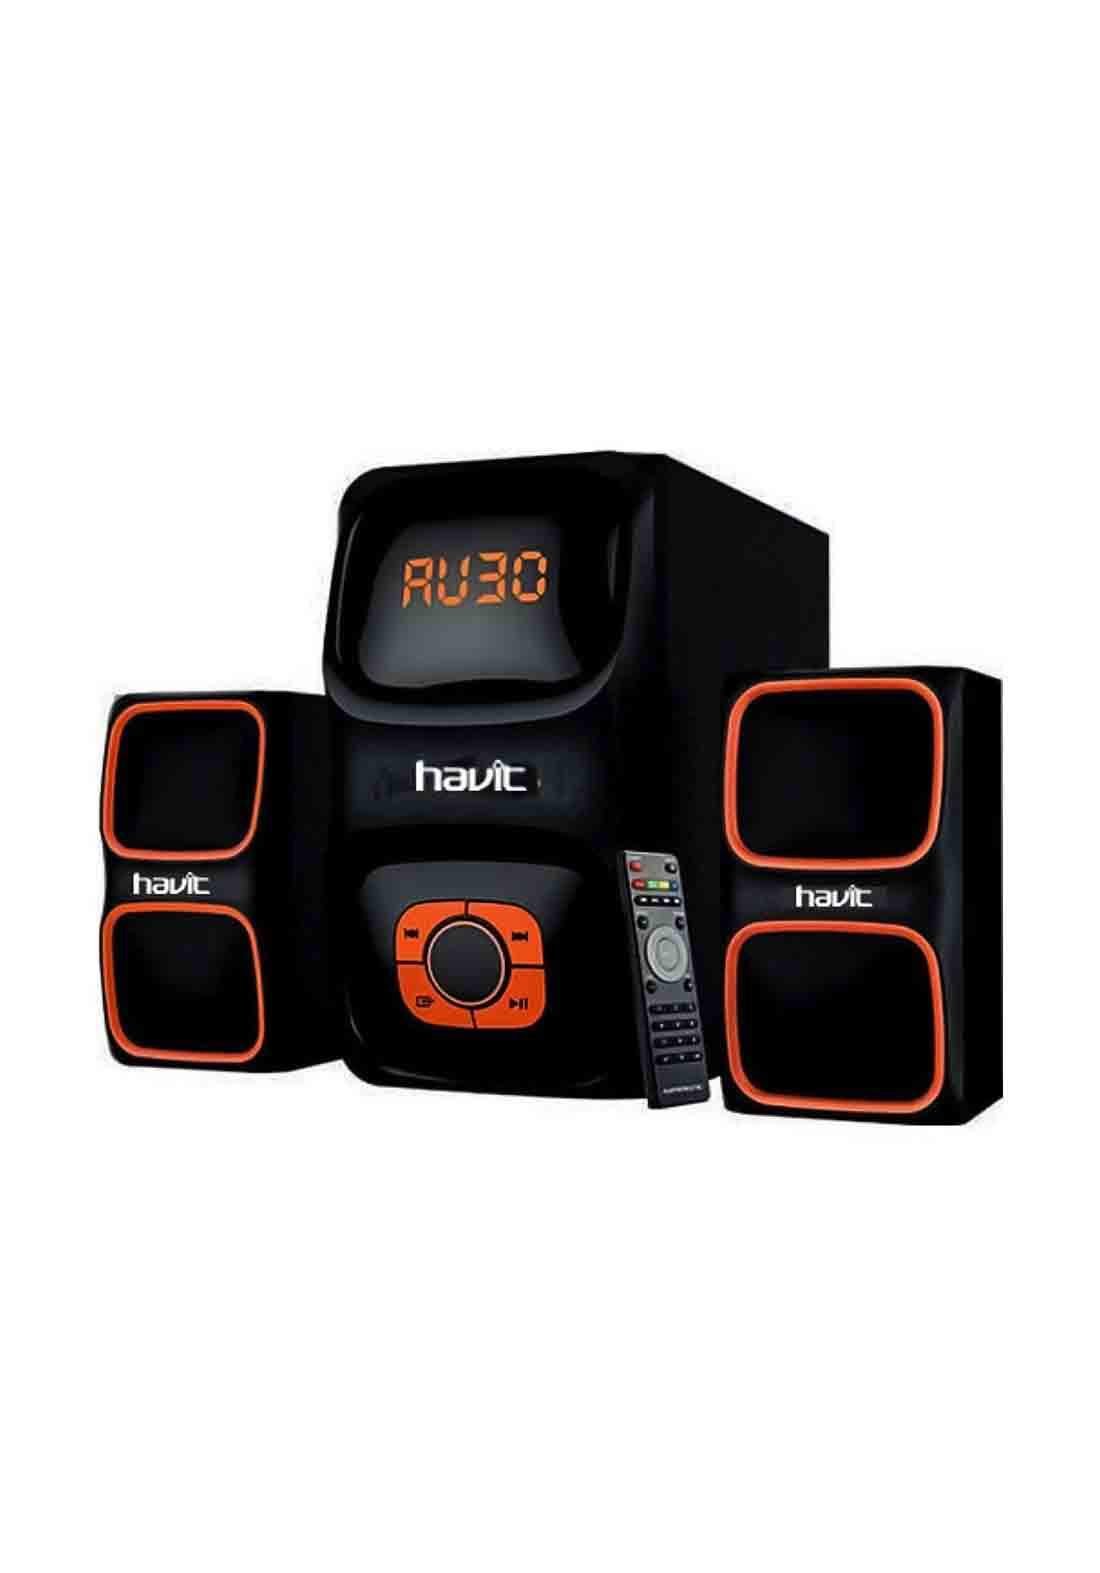 Havit HV-SF3088BT Multimedia Subwoofer Bluetooth Speaker - Black مكبر صوت (سبيكر)